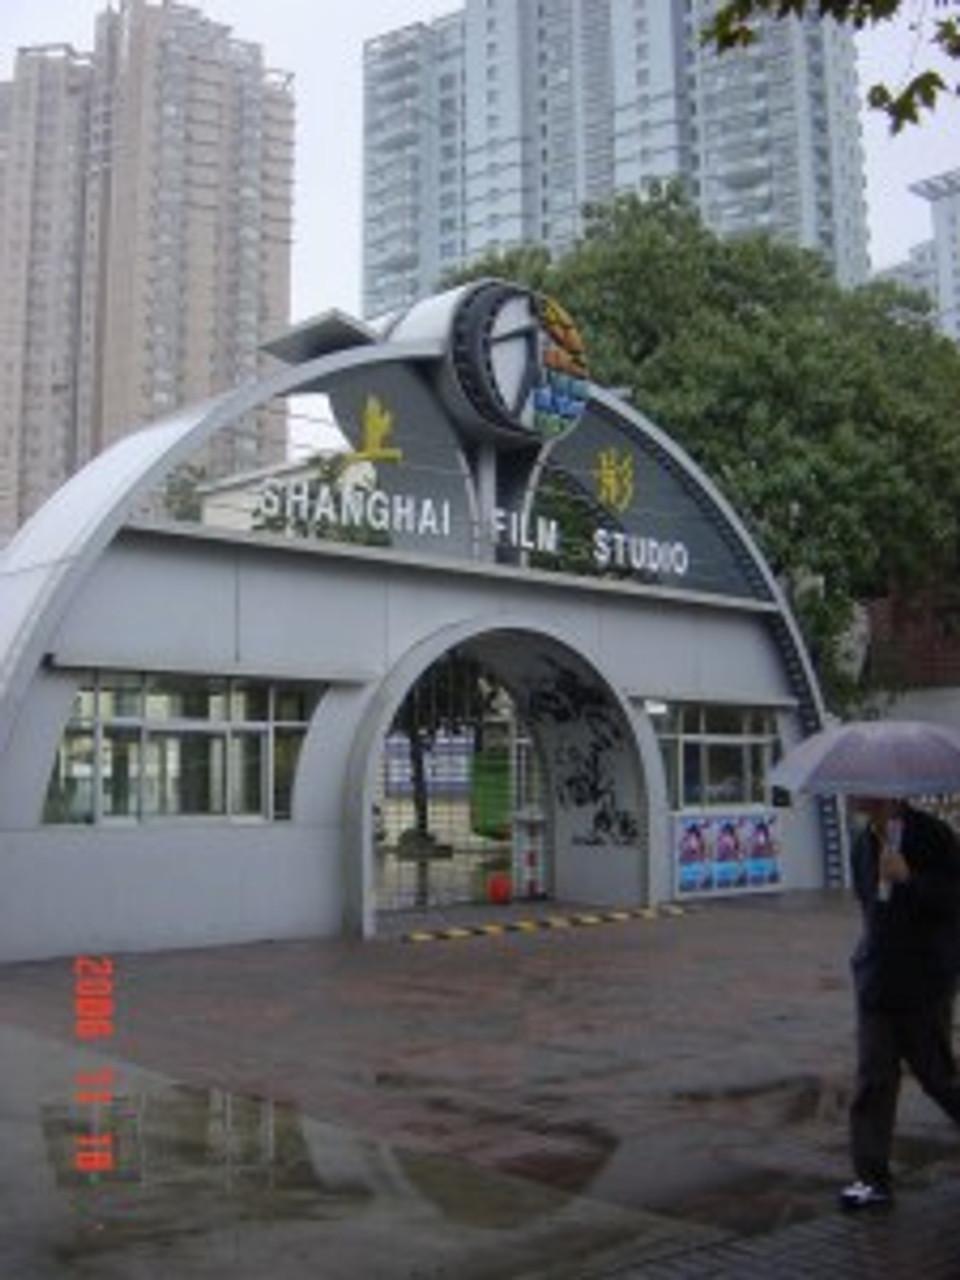 Shanghai Film Studio (photo by gumbase)